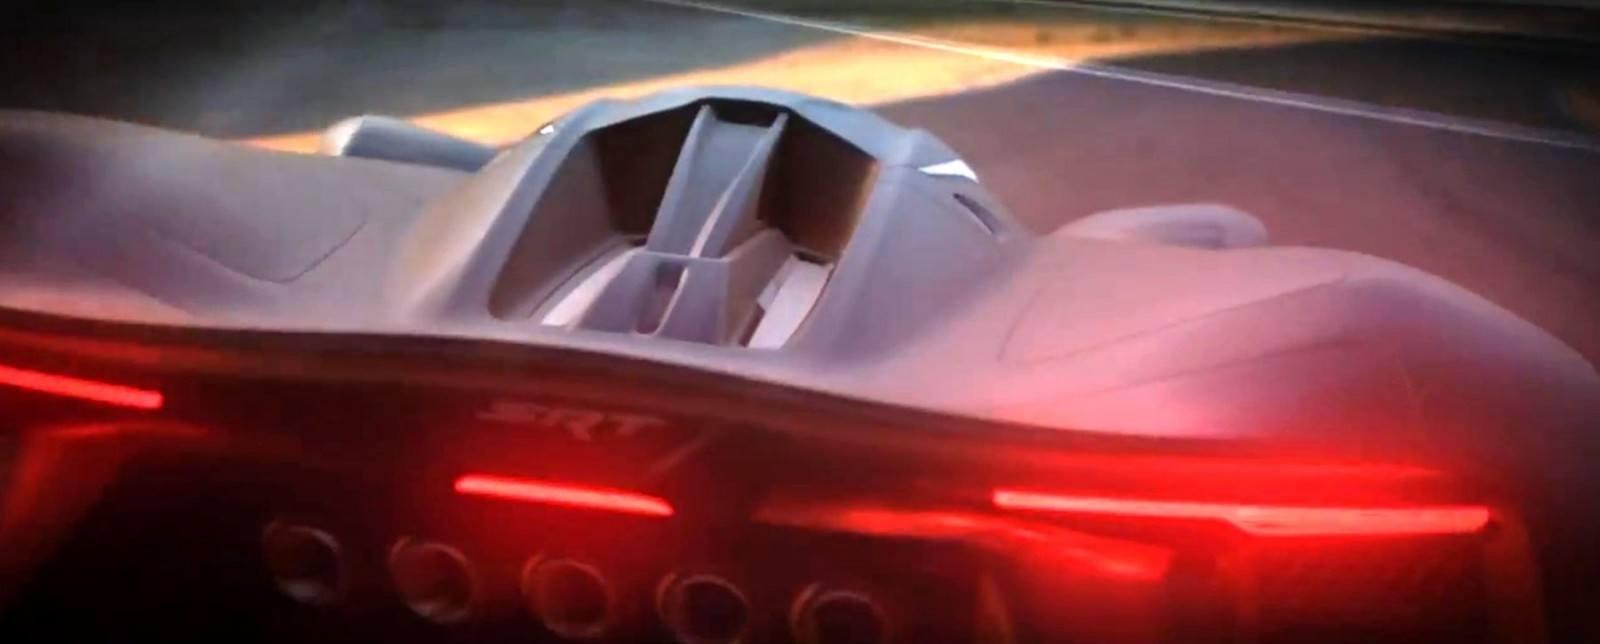 2015 SRT Tomahawk Vision Gran Turismo 9